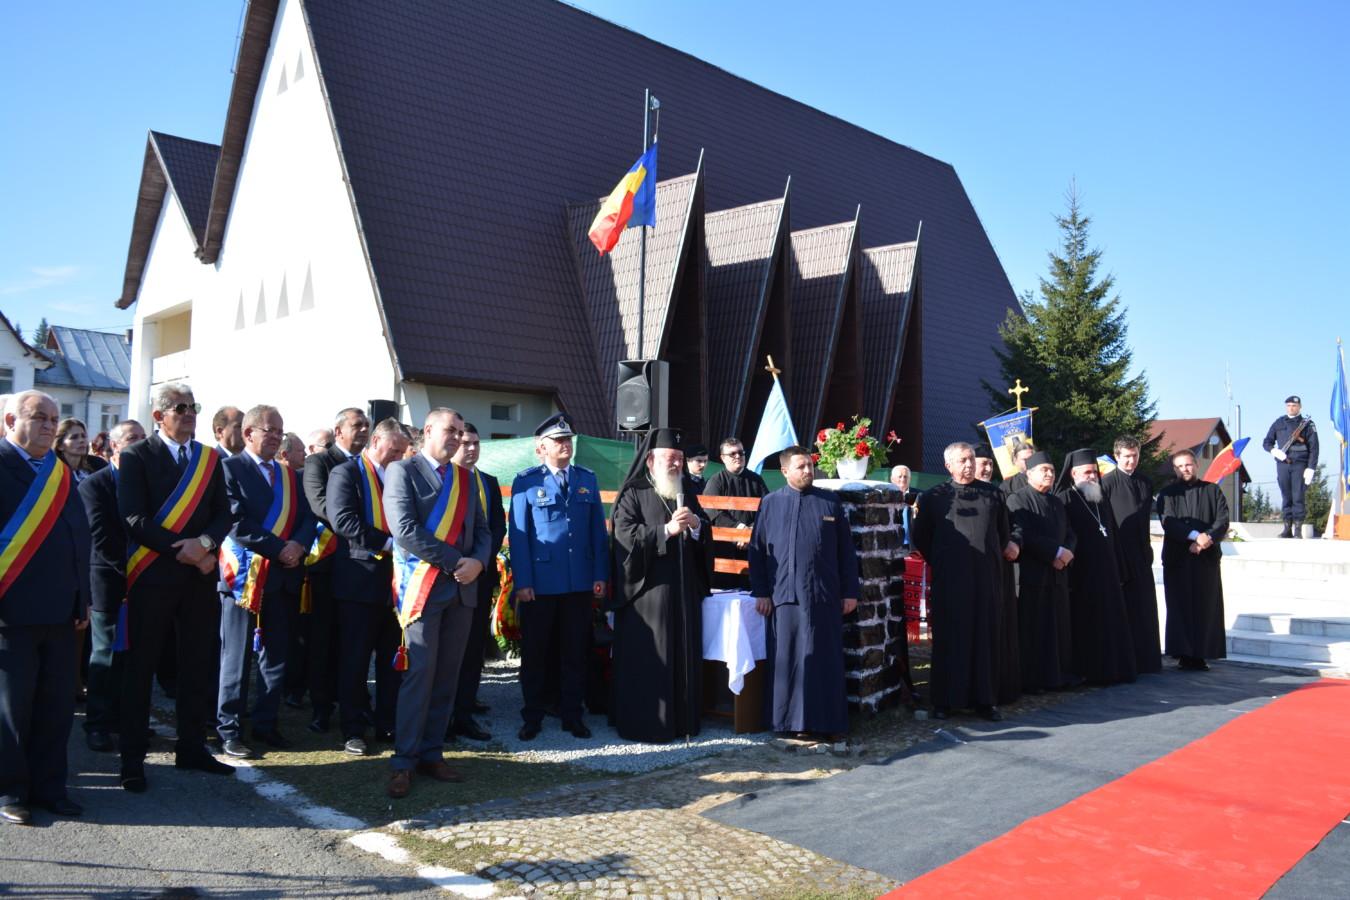 Martirii de la Beliș, comemorați la 100 de ani de la masacru